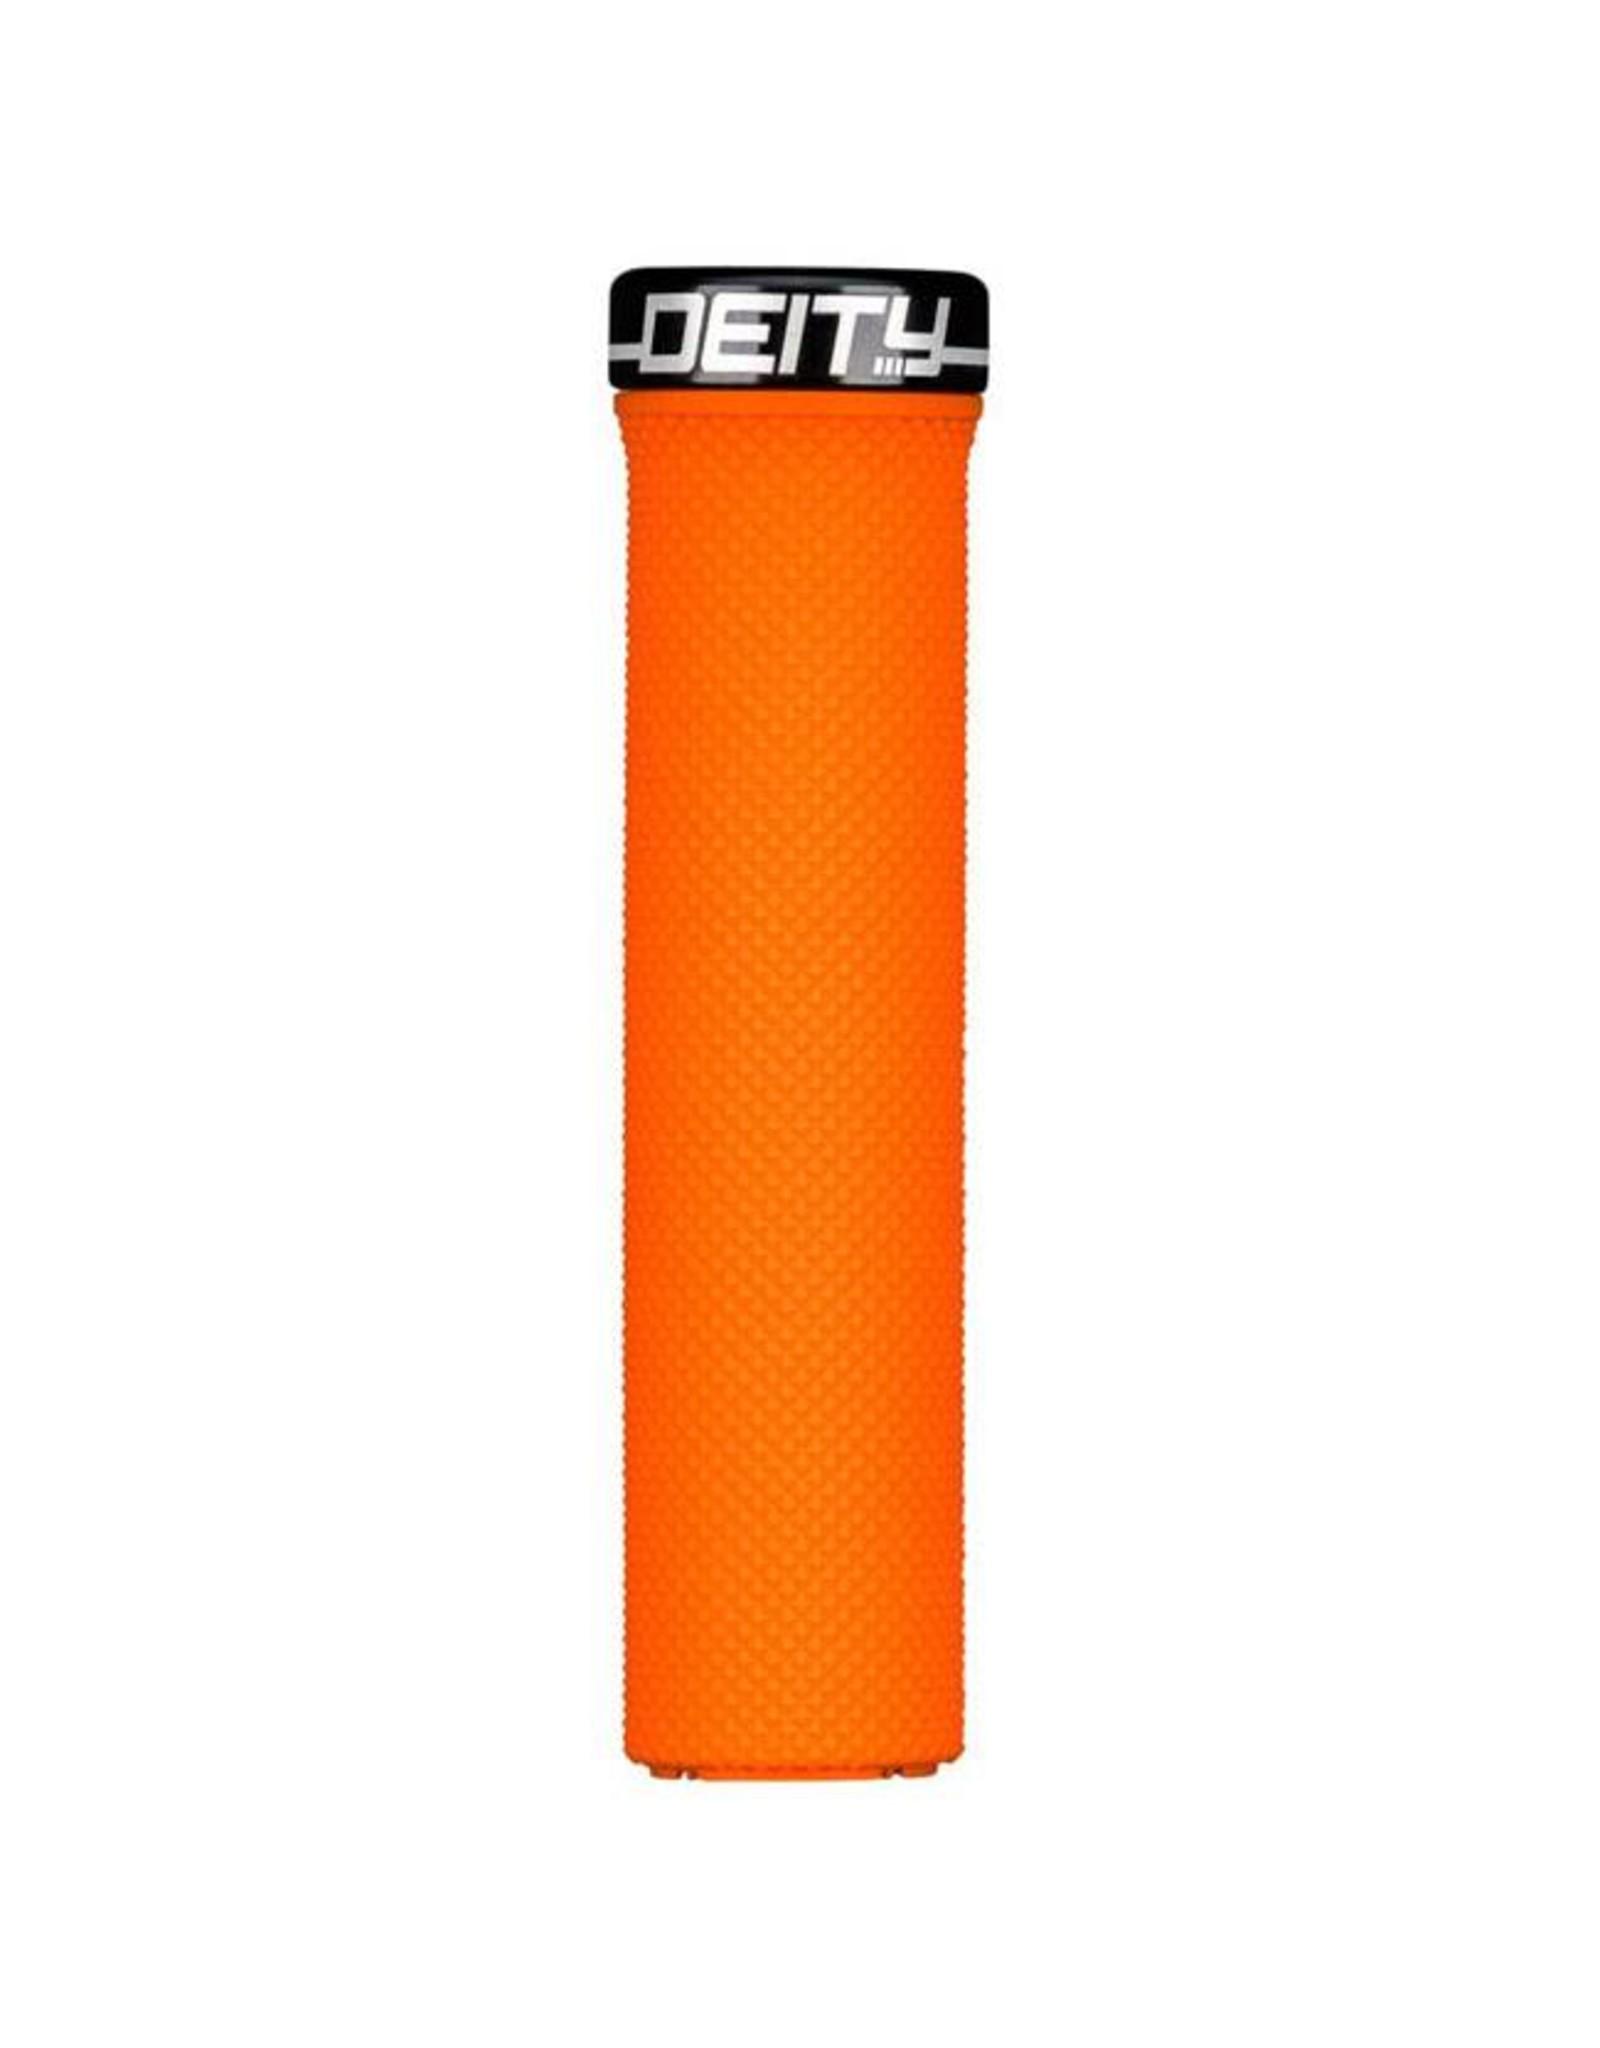 Deity Components Deity Waypoint Lock-on Grips: Orange with Black Clamp